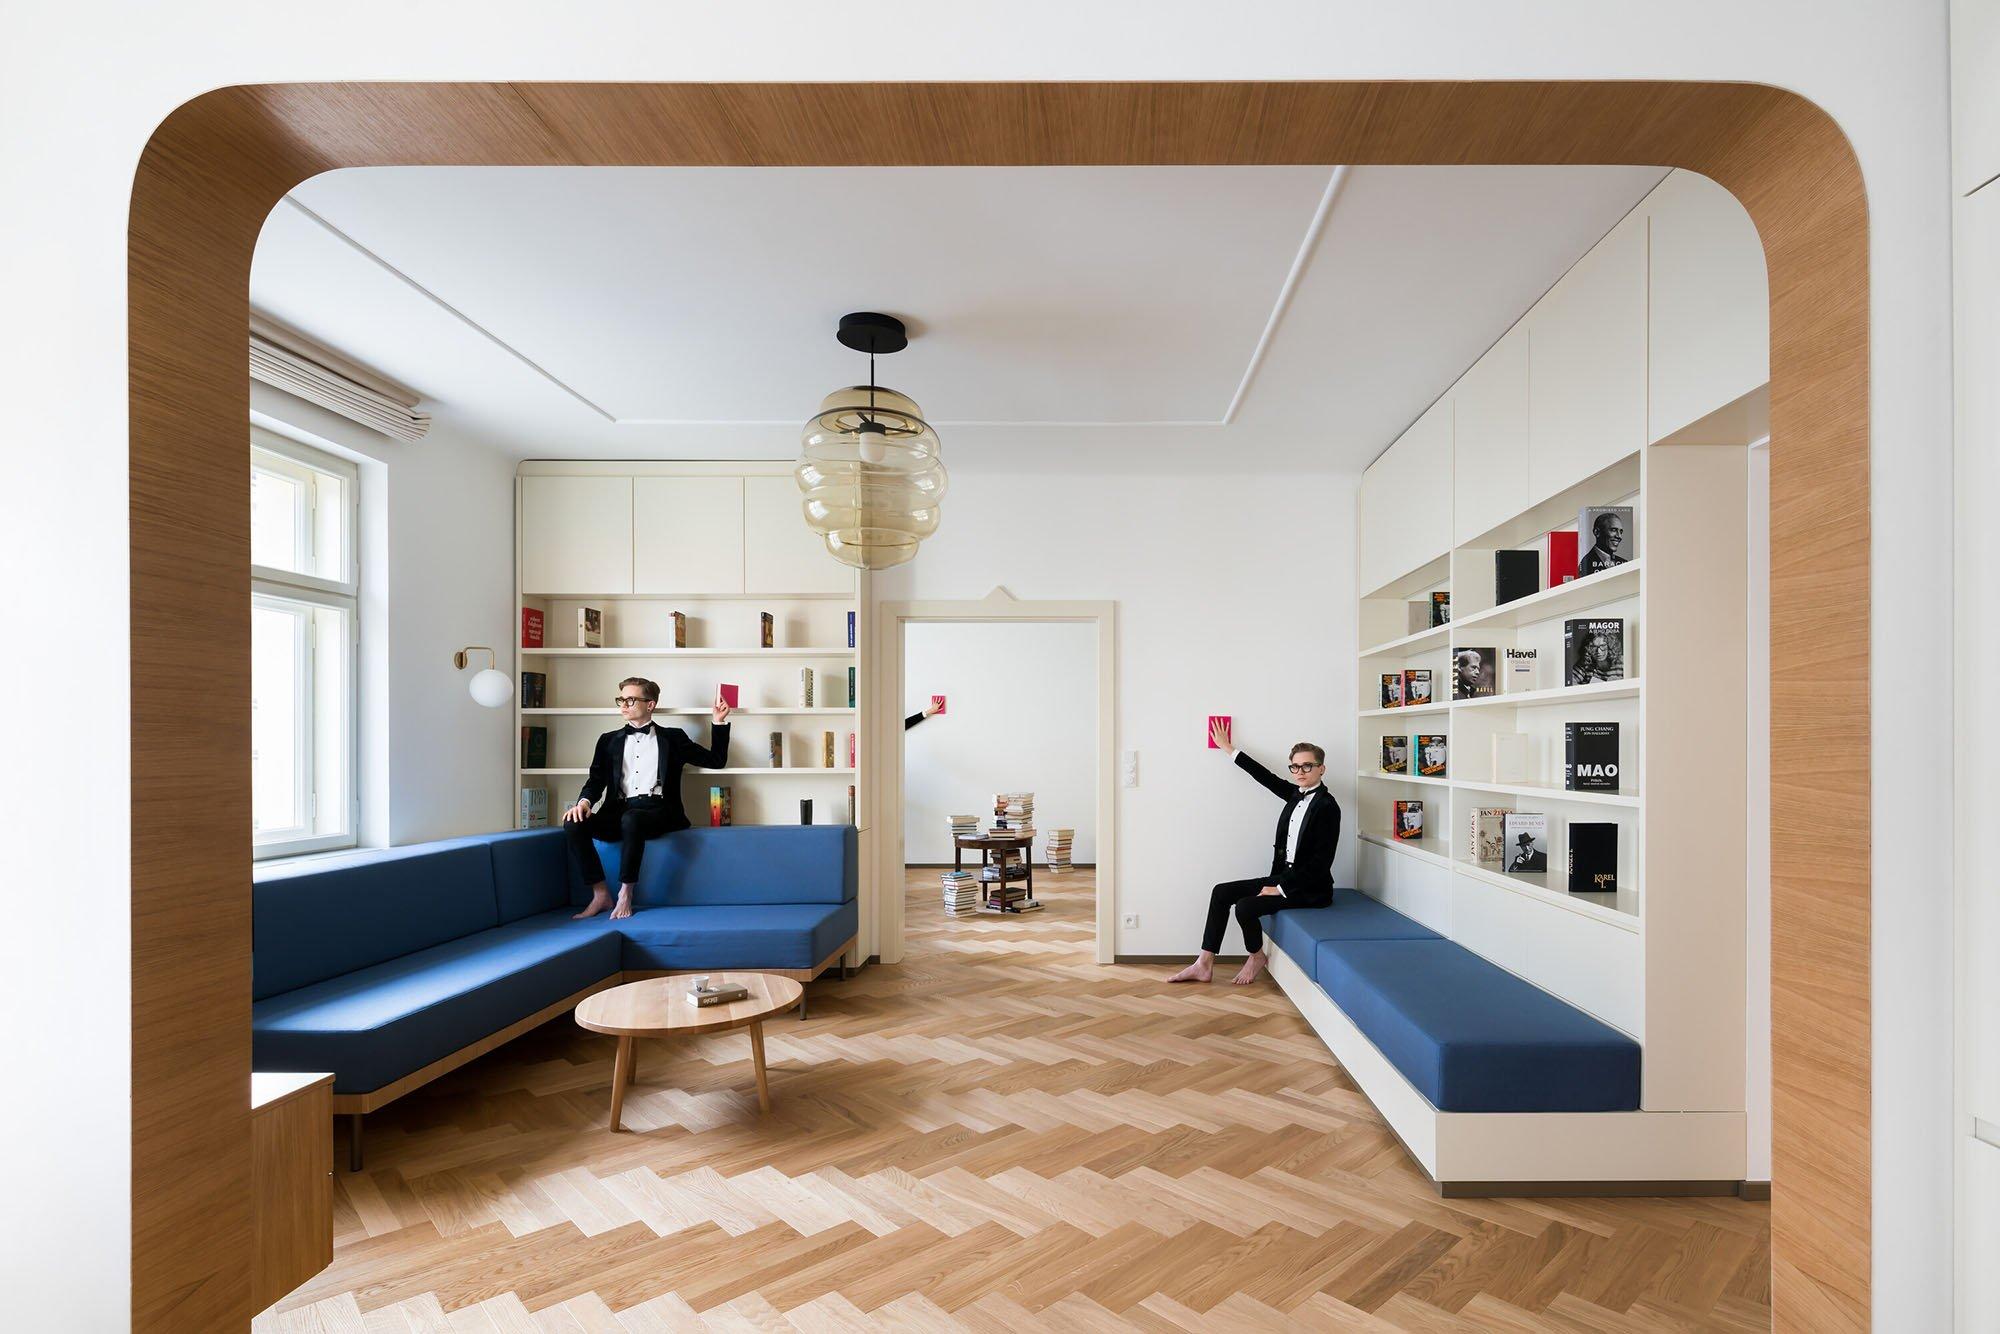 photo by Studio Flusser - No Architects